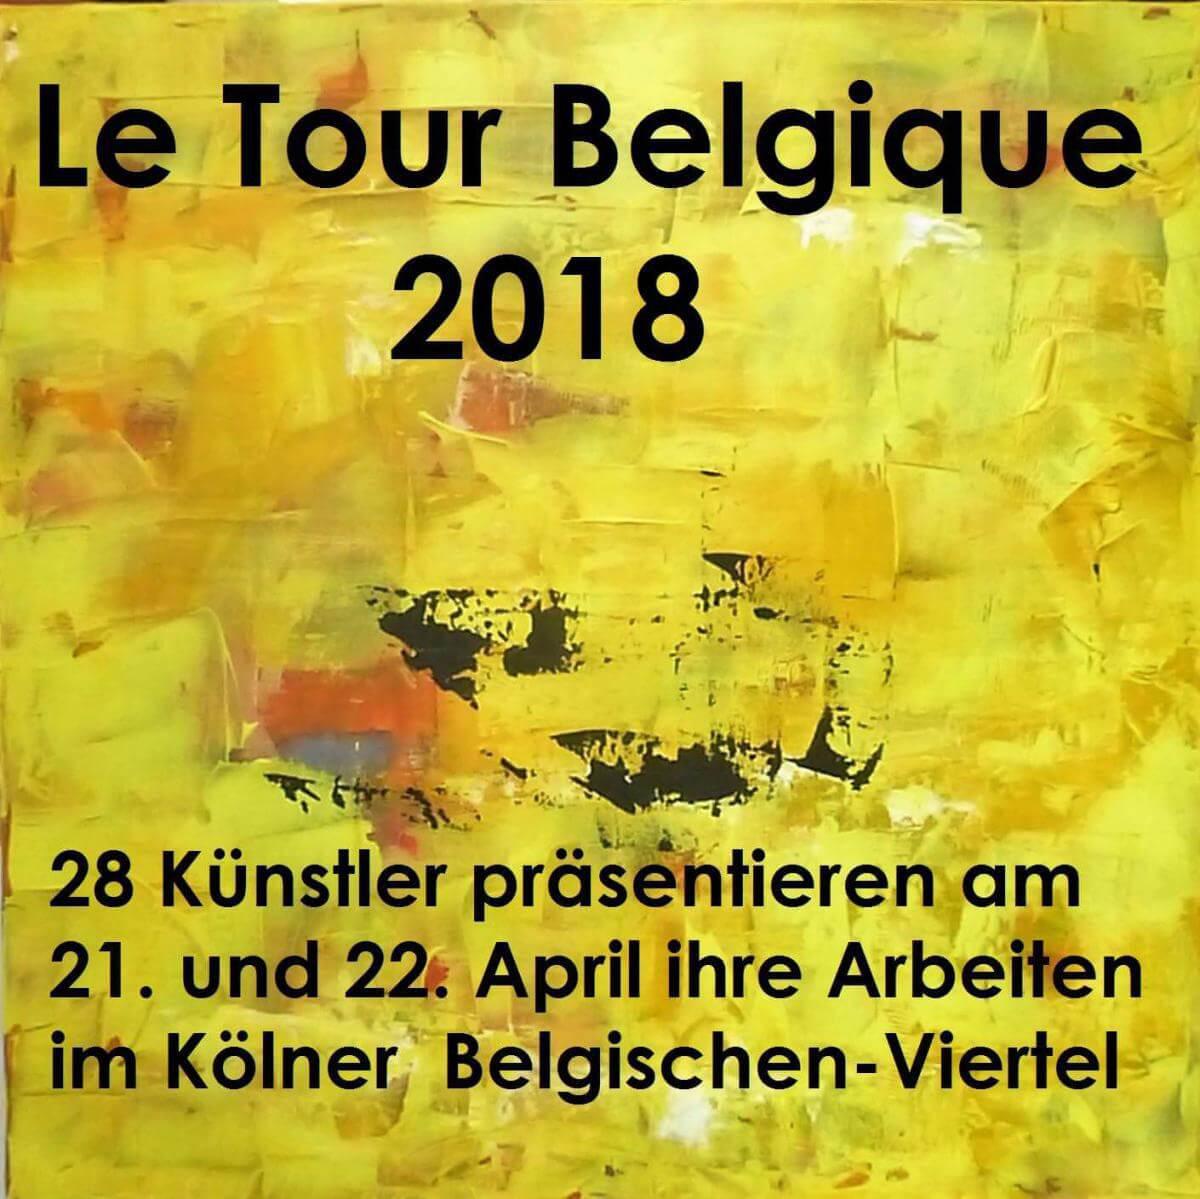 Gerd Victor Bünte 16.02.2019 - 08:53